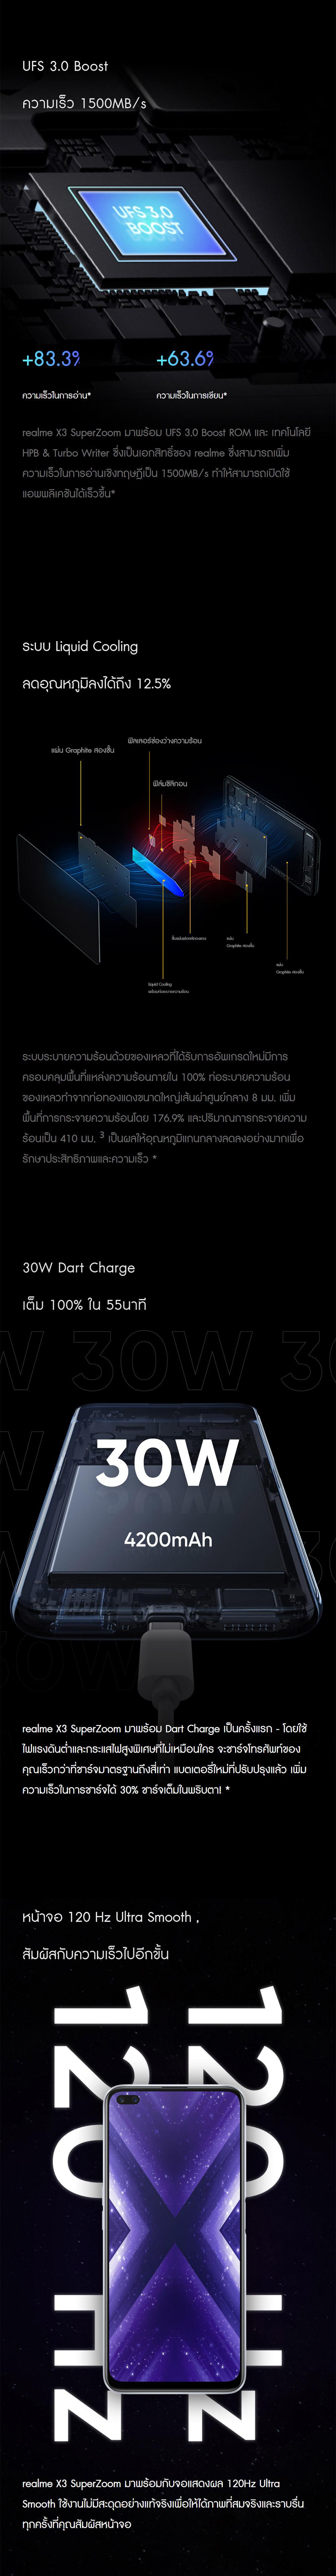 03-3000086087-feature-2_2.jpg